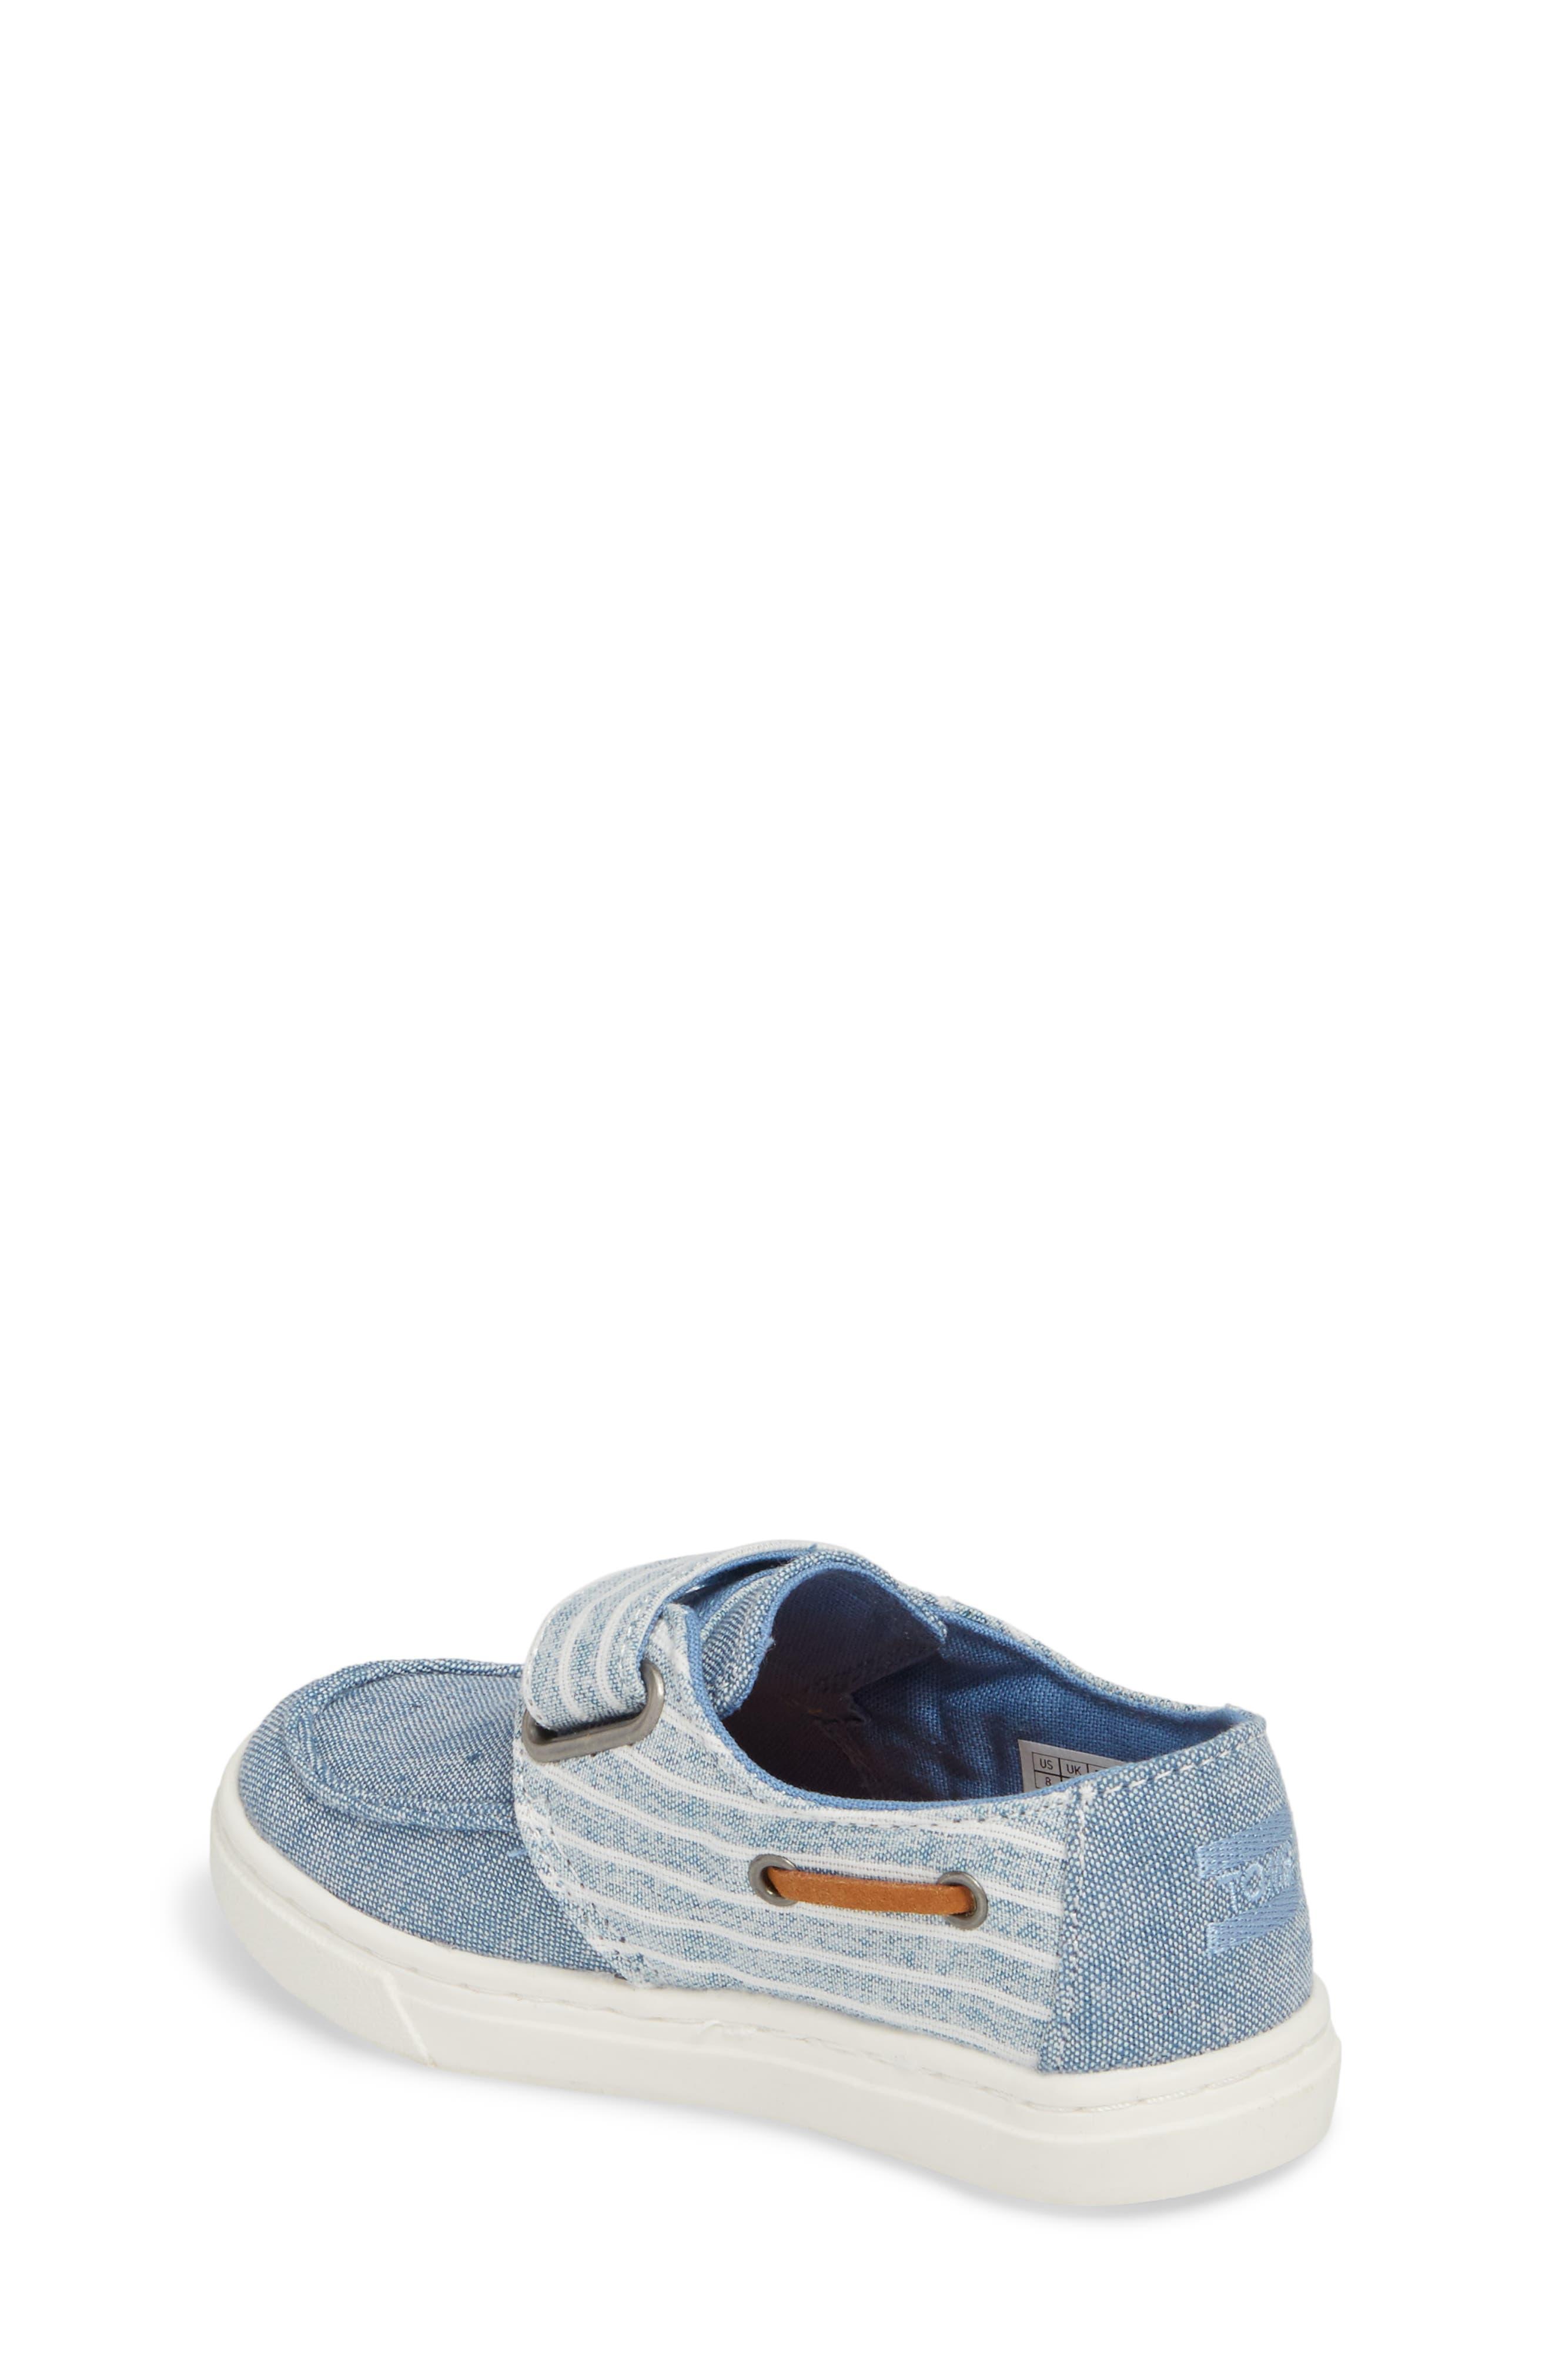 Culver Boat Shoe,                             Alternate thumbnail 2, color,                             BLUE CHAMBRAY/ STRIPE